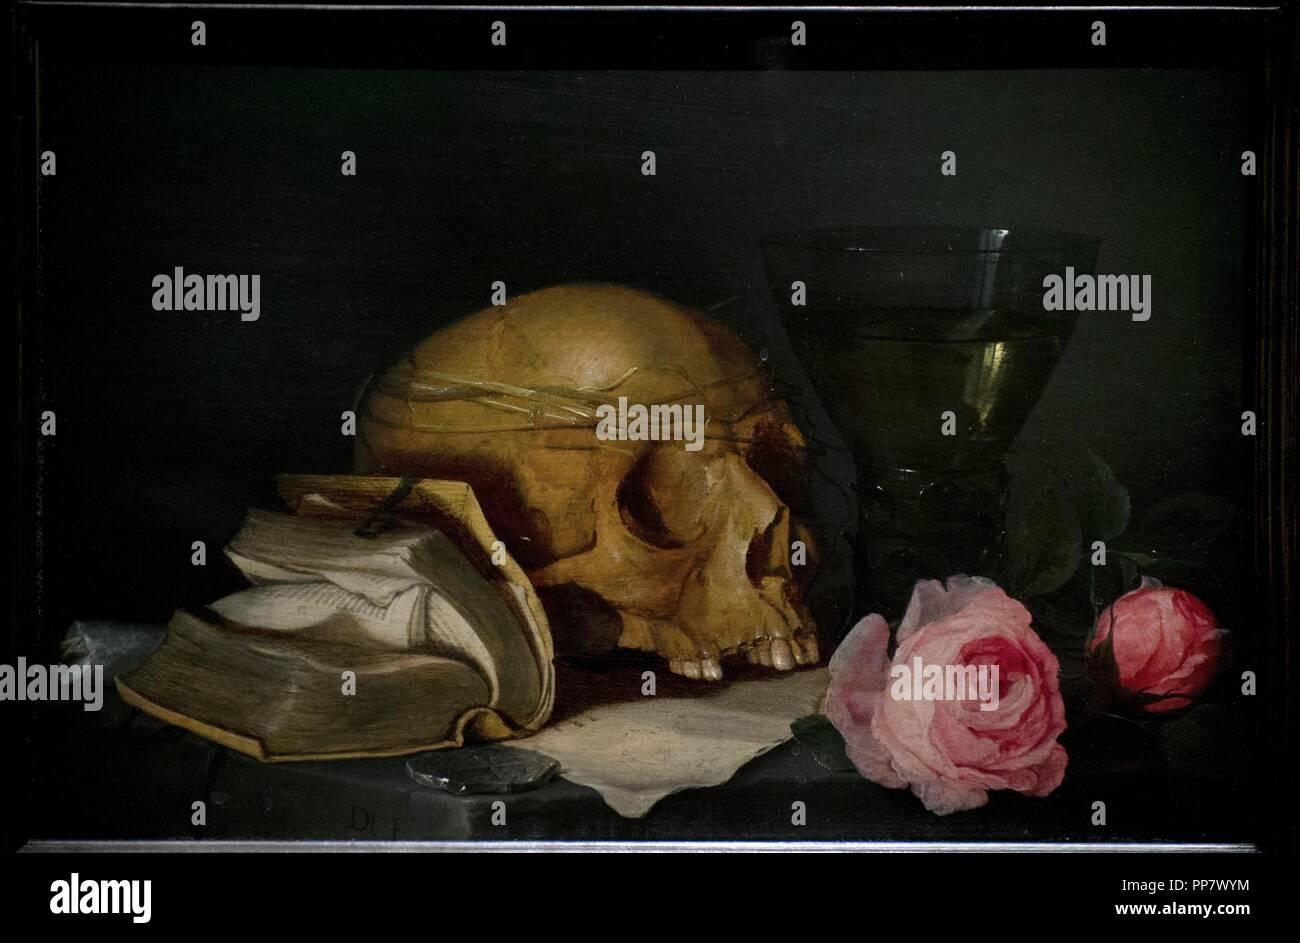 Jan Davidsz. de Heem (1606-1683/1684). Flemish painter. A Vanitas Still Life with a Skull, a Book and Roses, c. 1630. National Museum. Stockholm. Sweden. Stock Photo